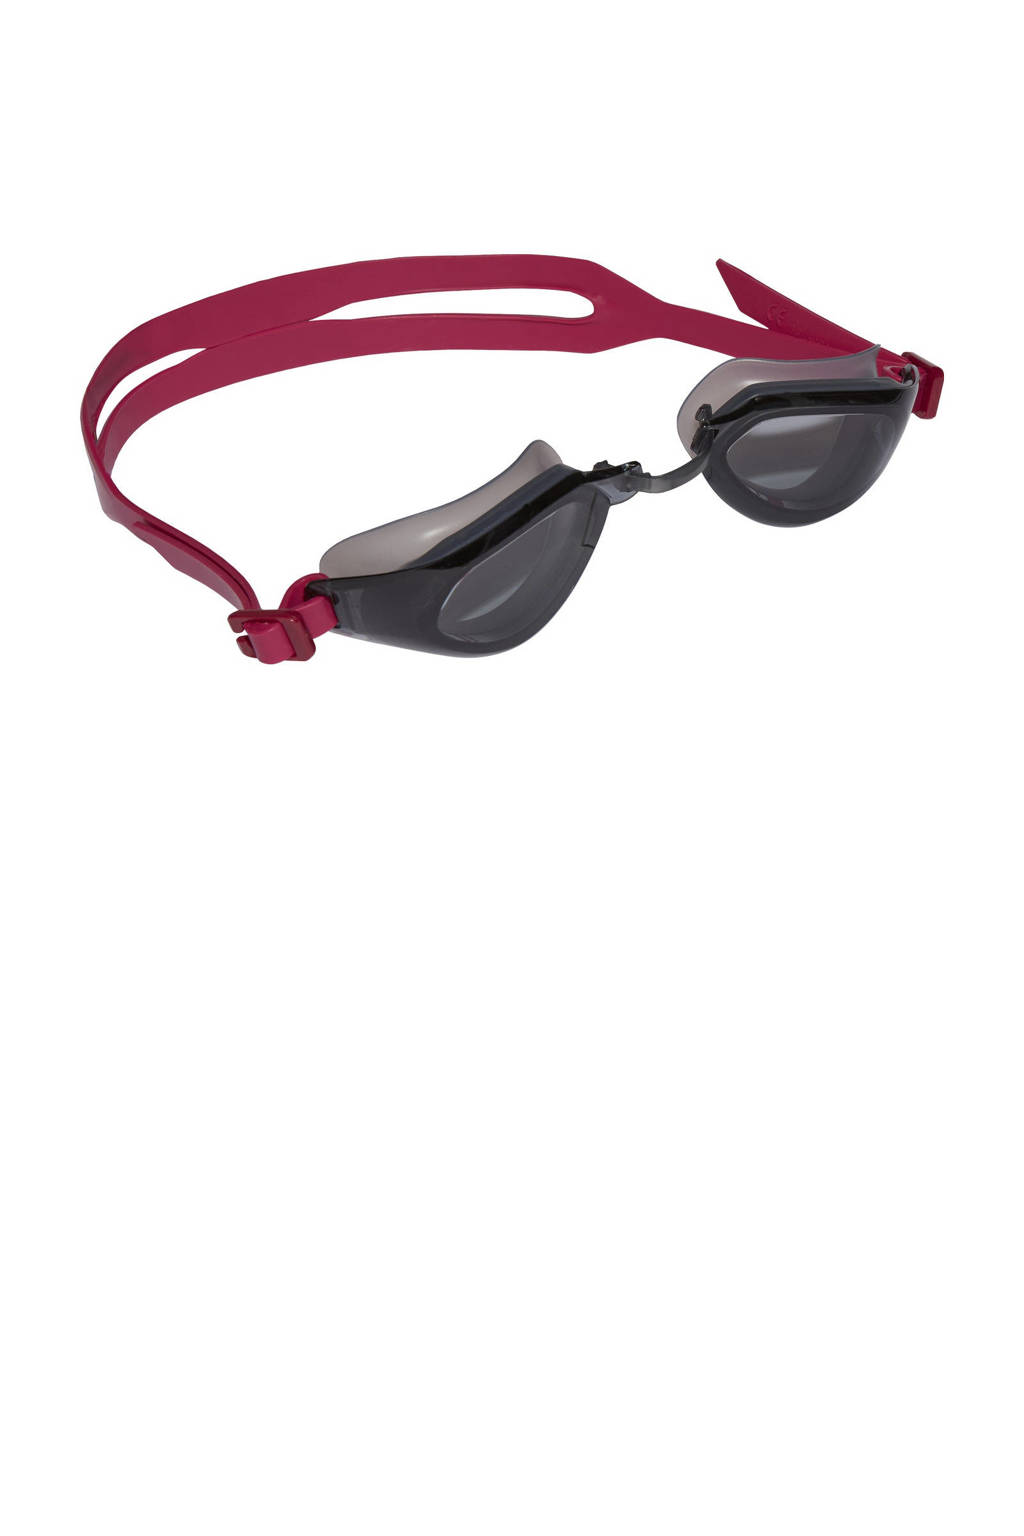 adidas Performance zwembril Peristar met anti-fog zwart/rood, Zwart/rood